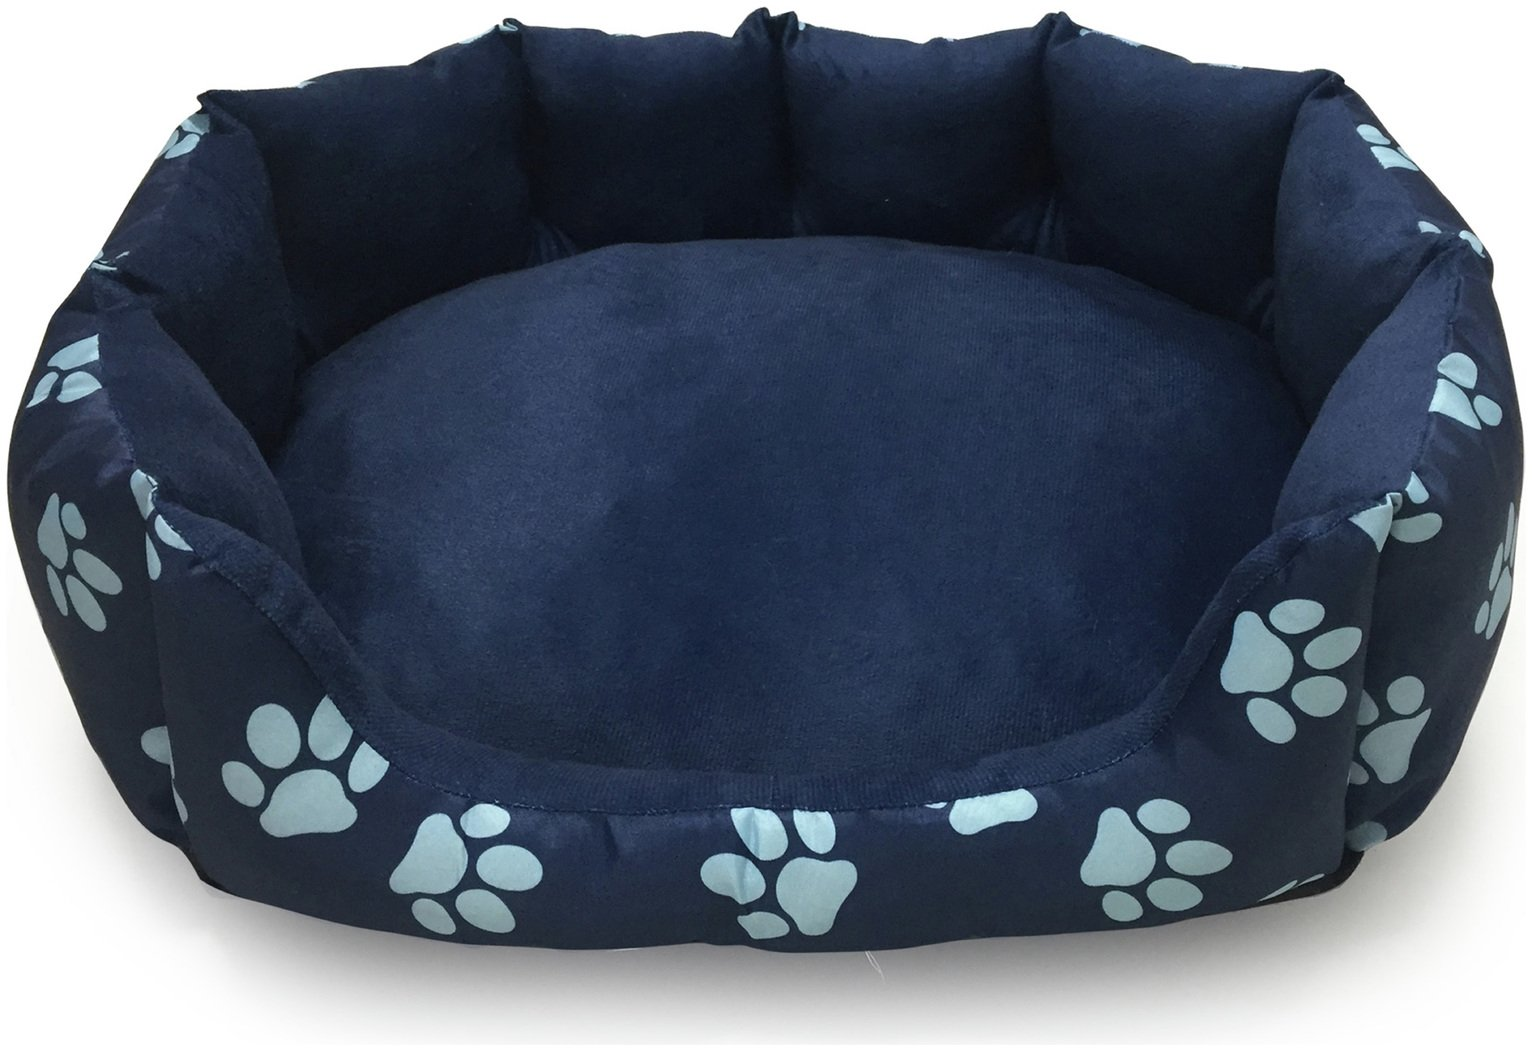 Paw Print Fleece Oval Navy Cushion - Large